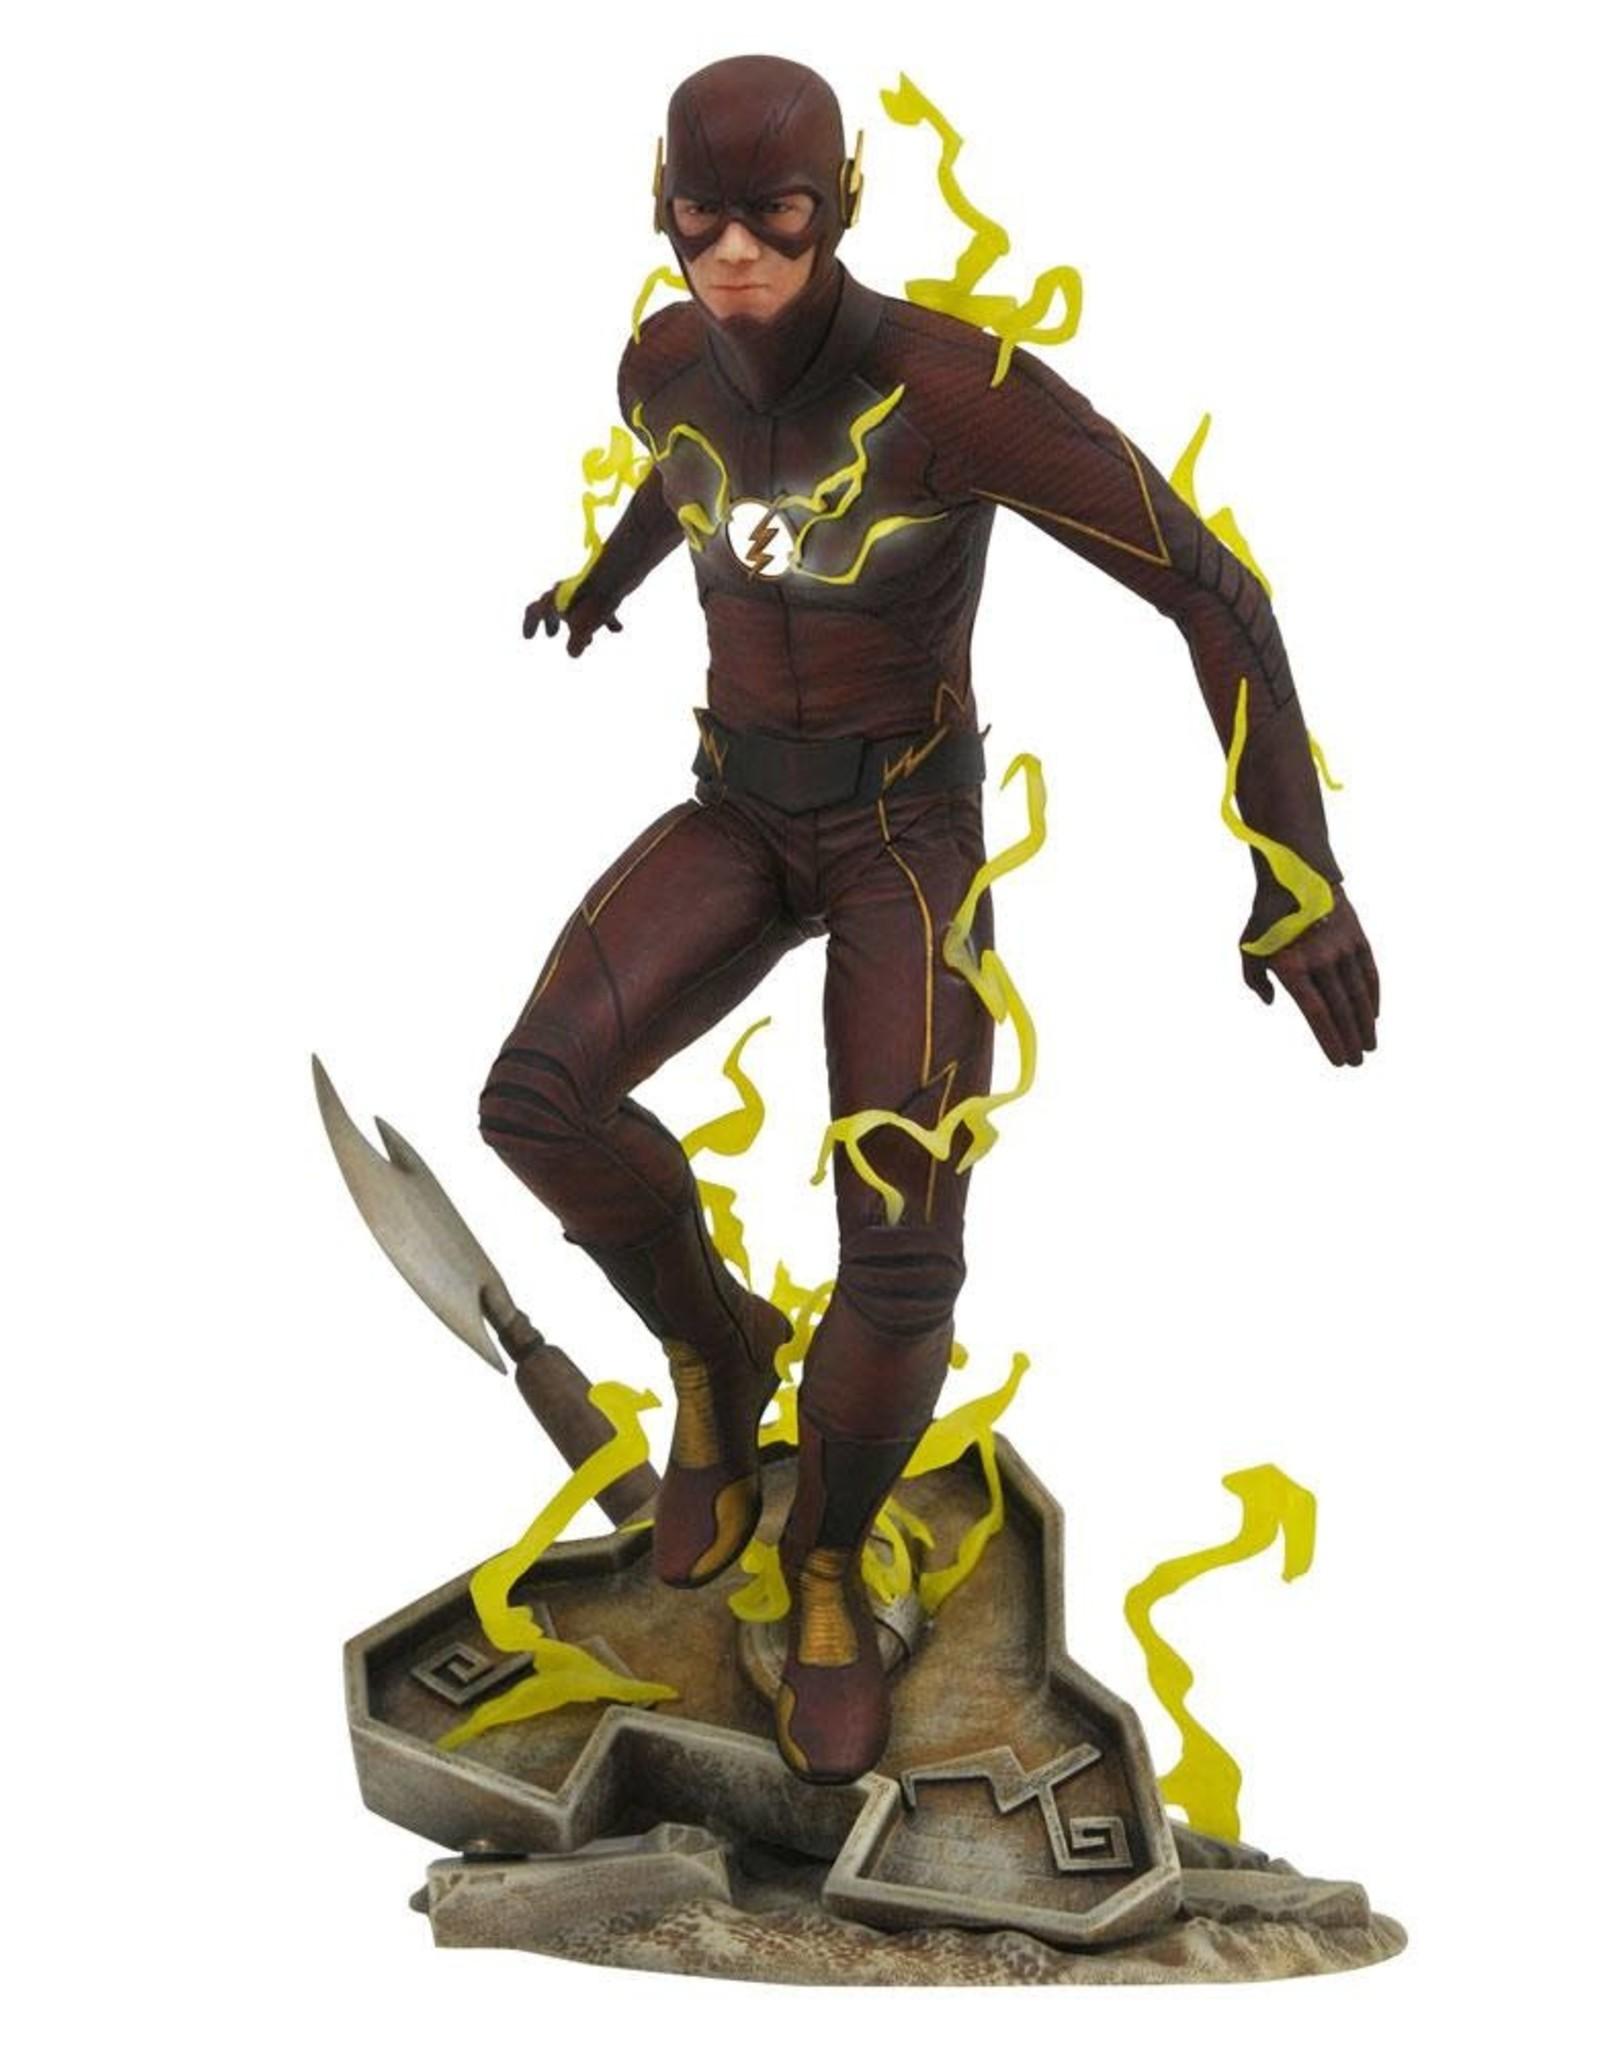 Diamond Select DC COMICS Gallery Diorama 23cm - The Flash